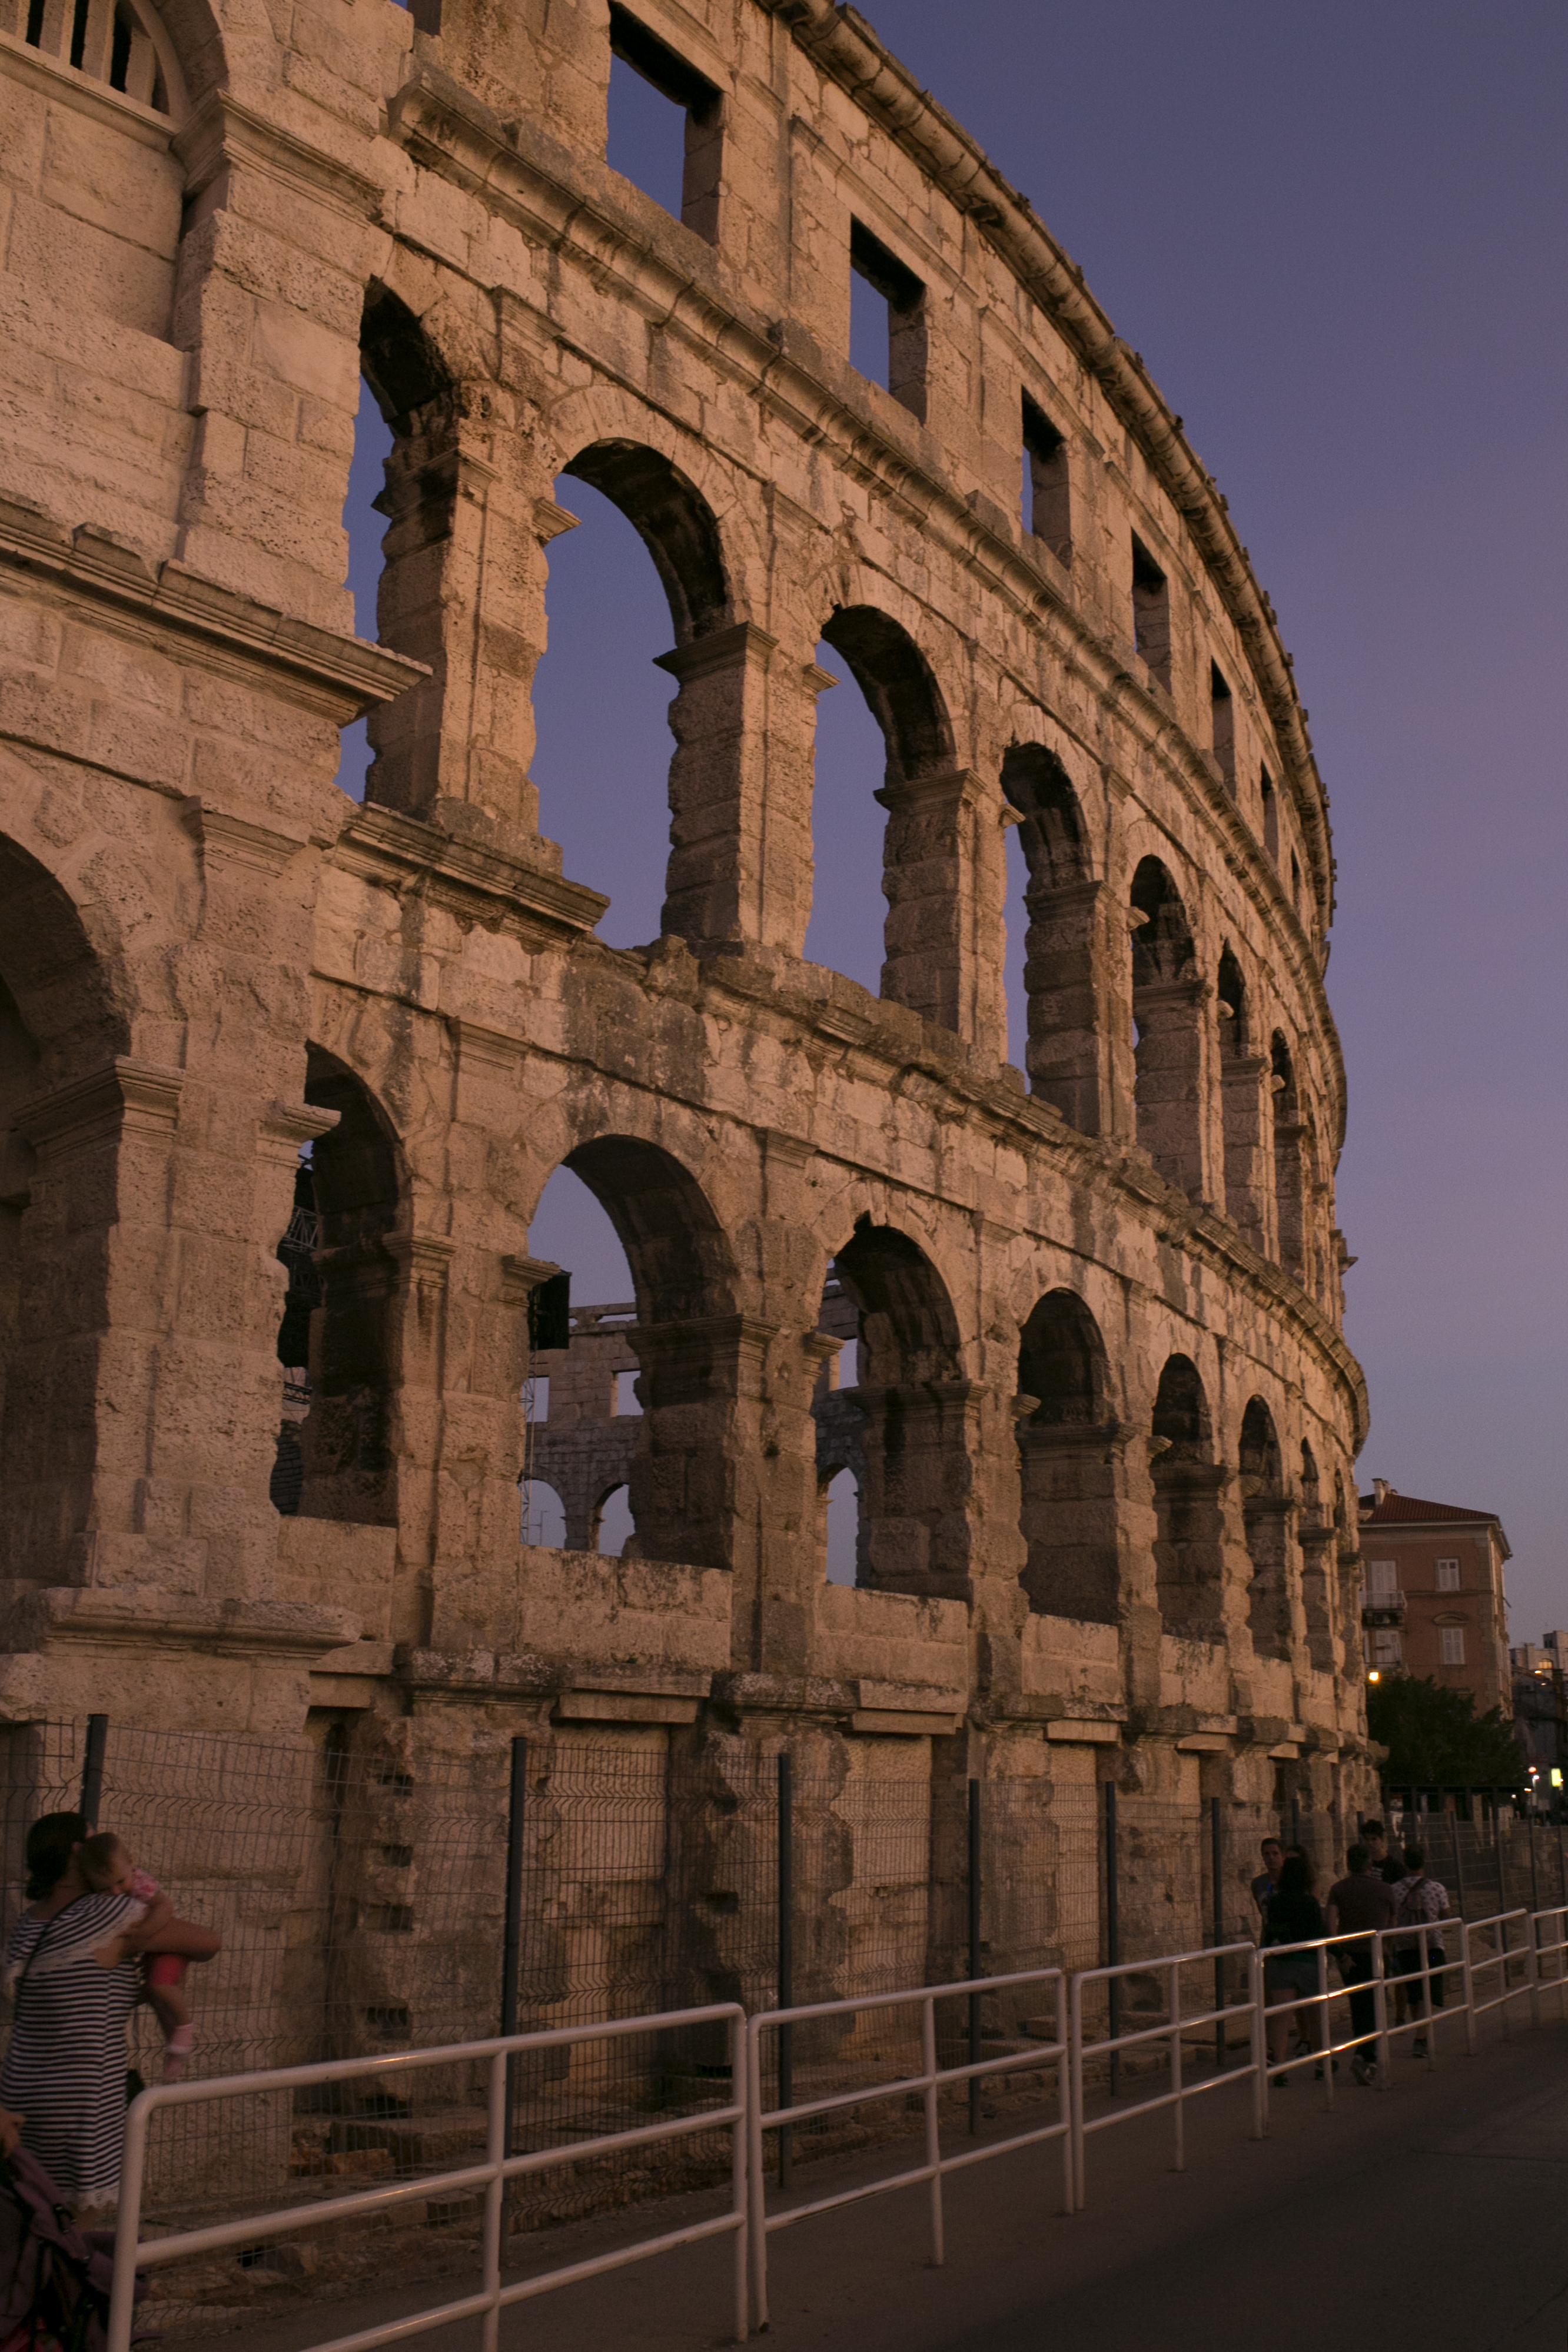 Pula Coloseum